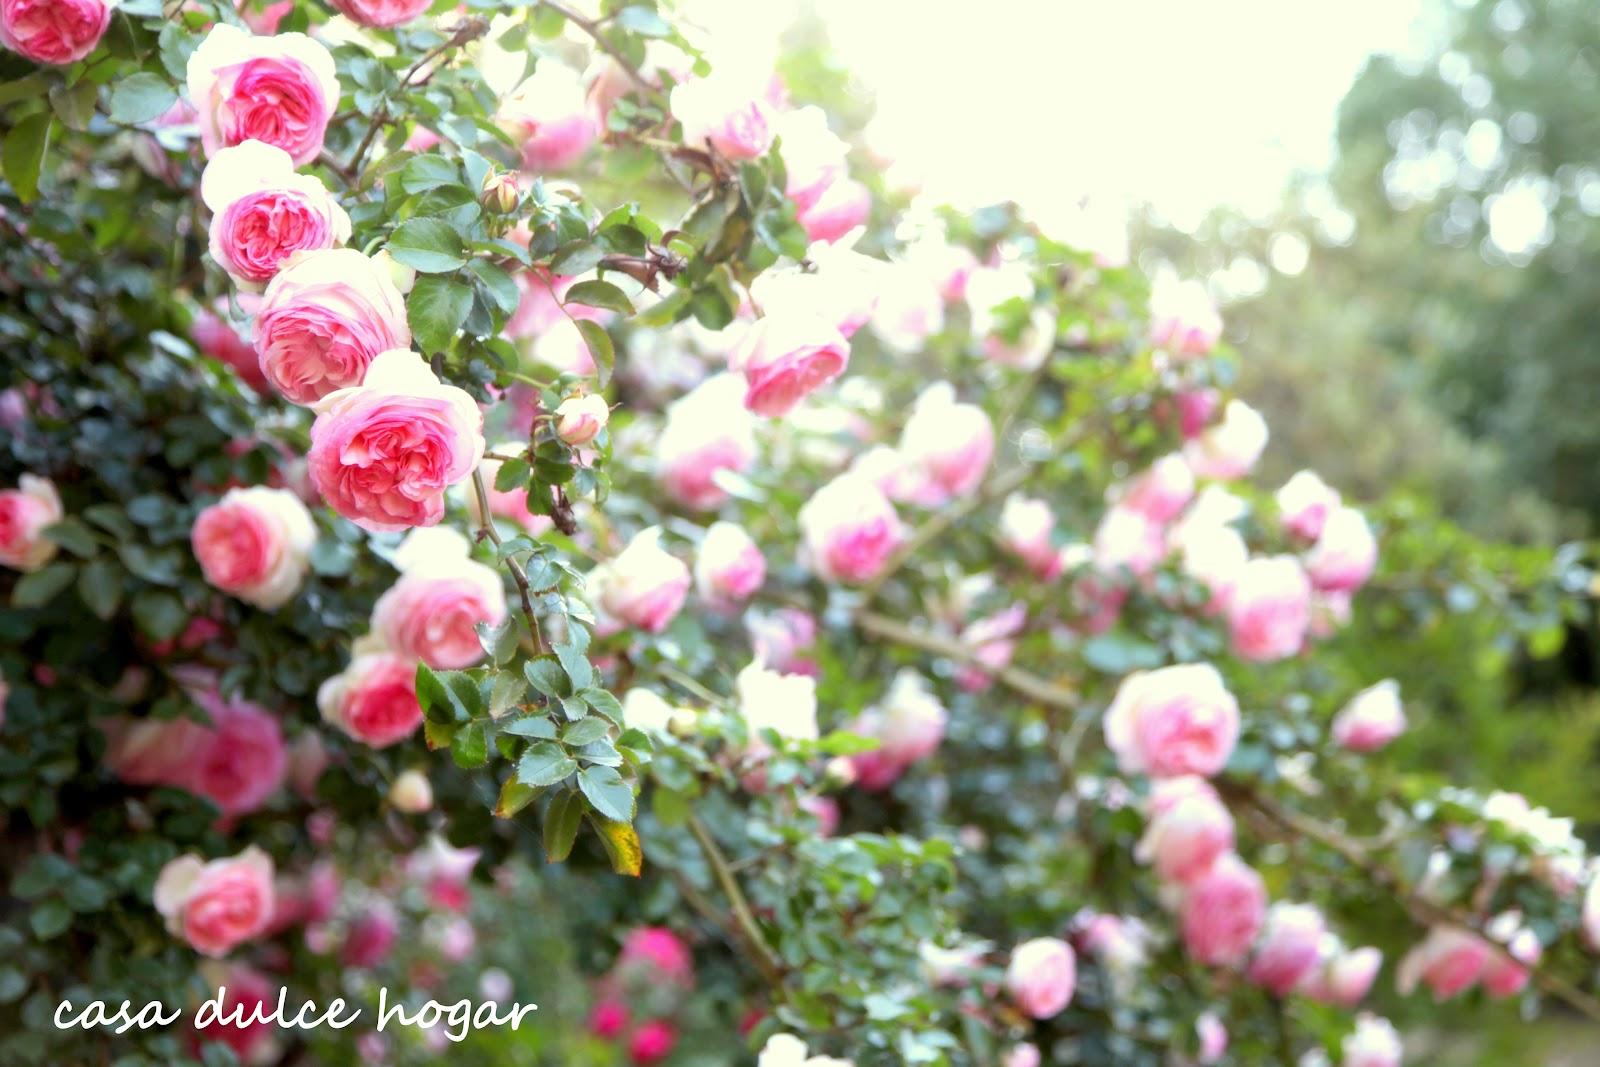 Casa dulce hogar pierre de ronsard roses and clouds - Casas en roses ...